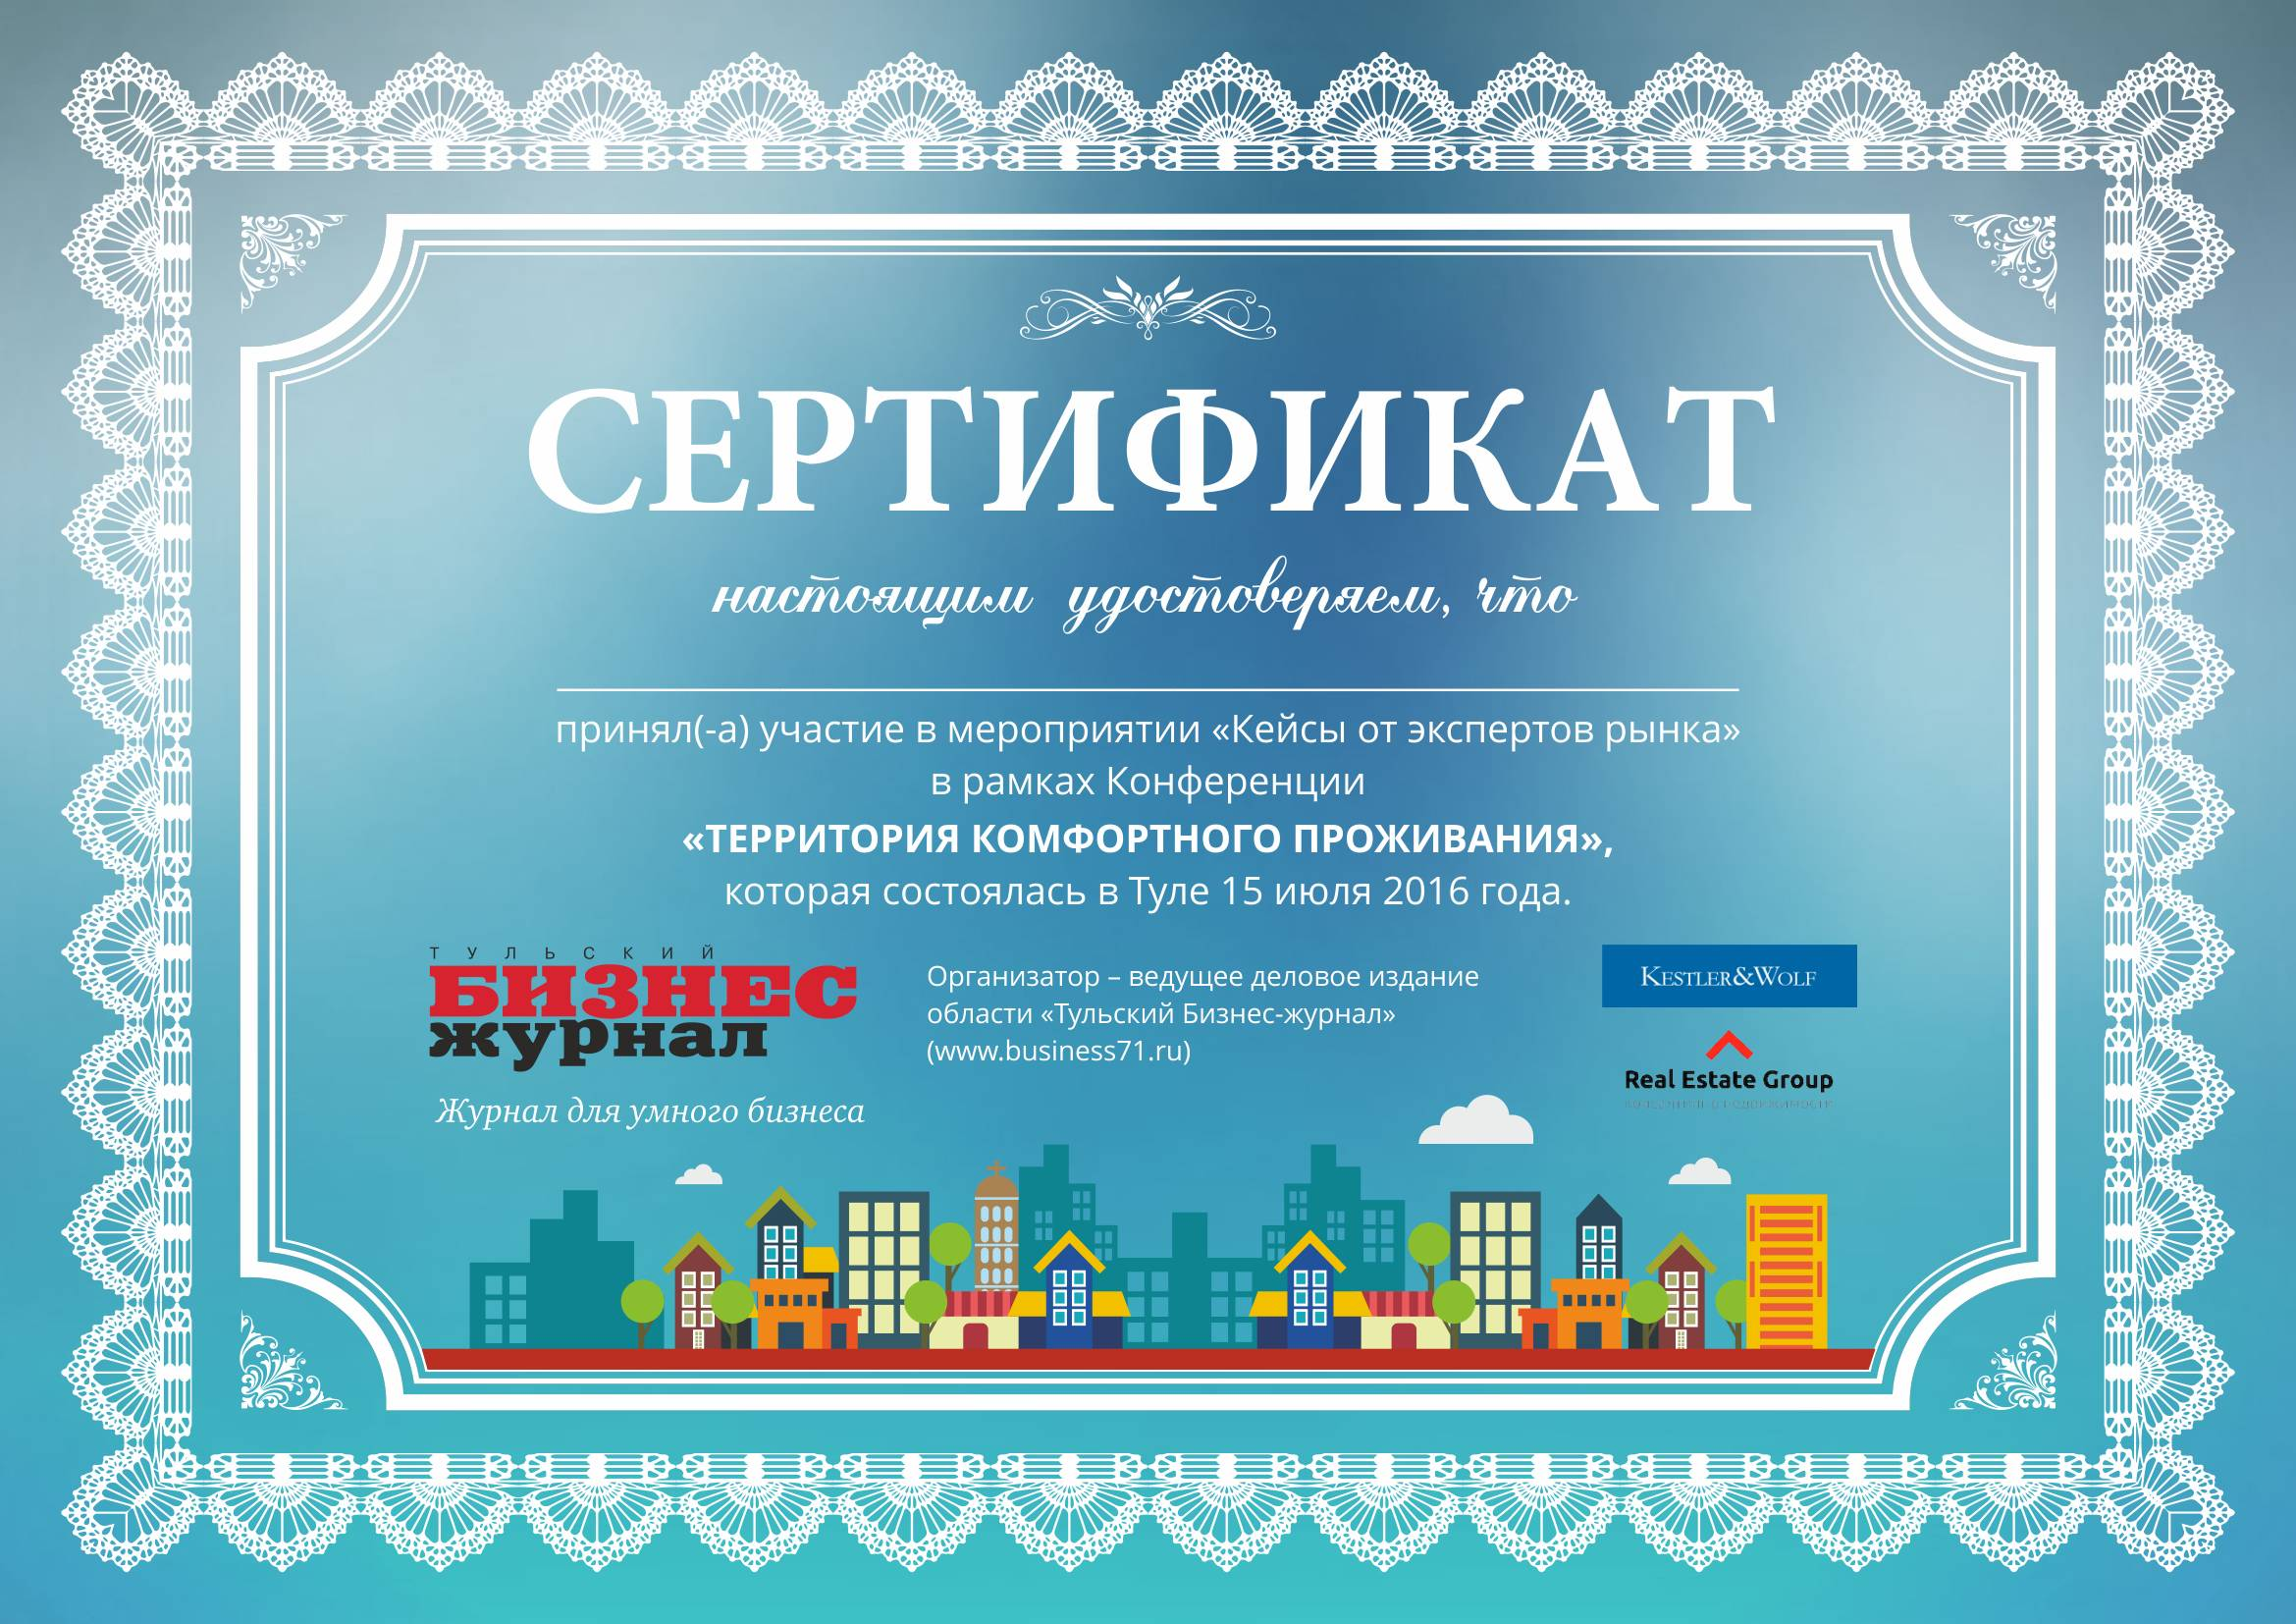 sertifikat_konferencija_tula_15-07-2015